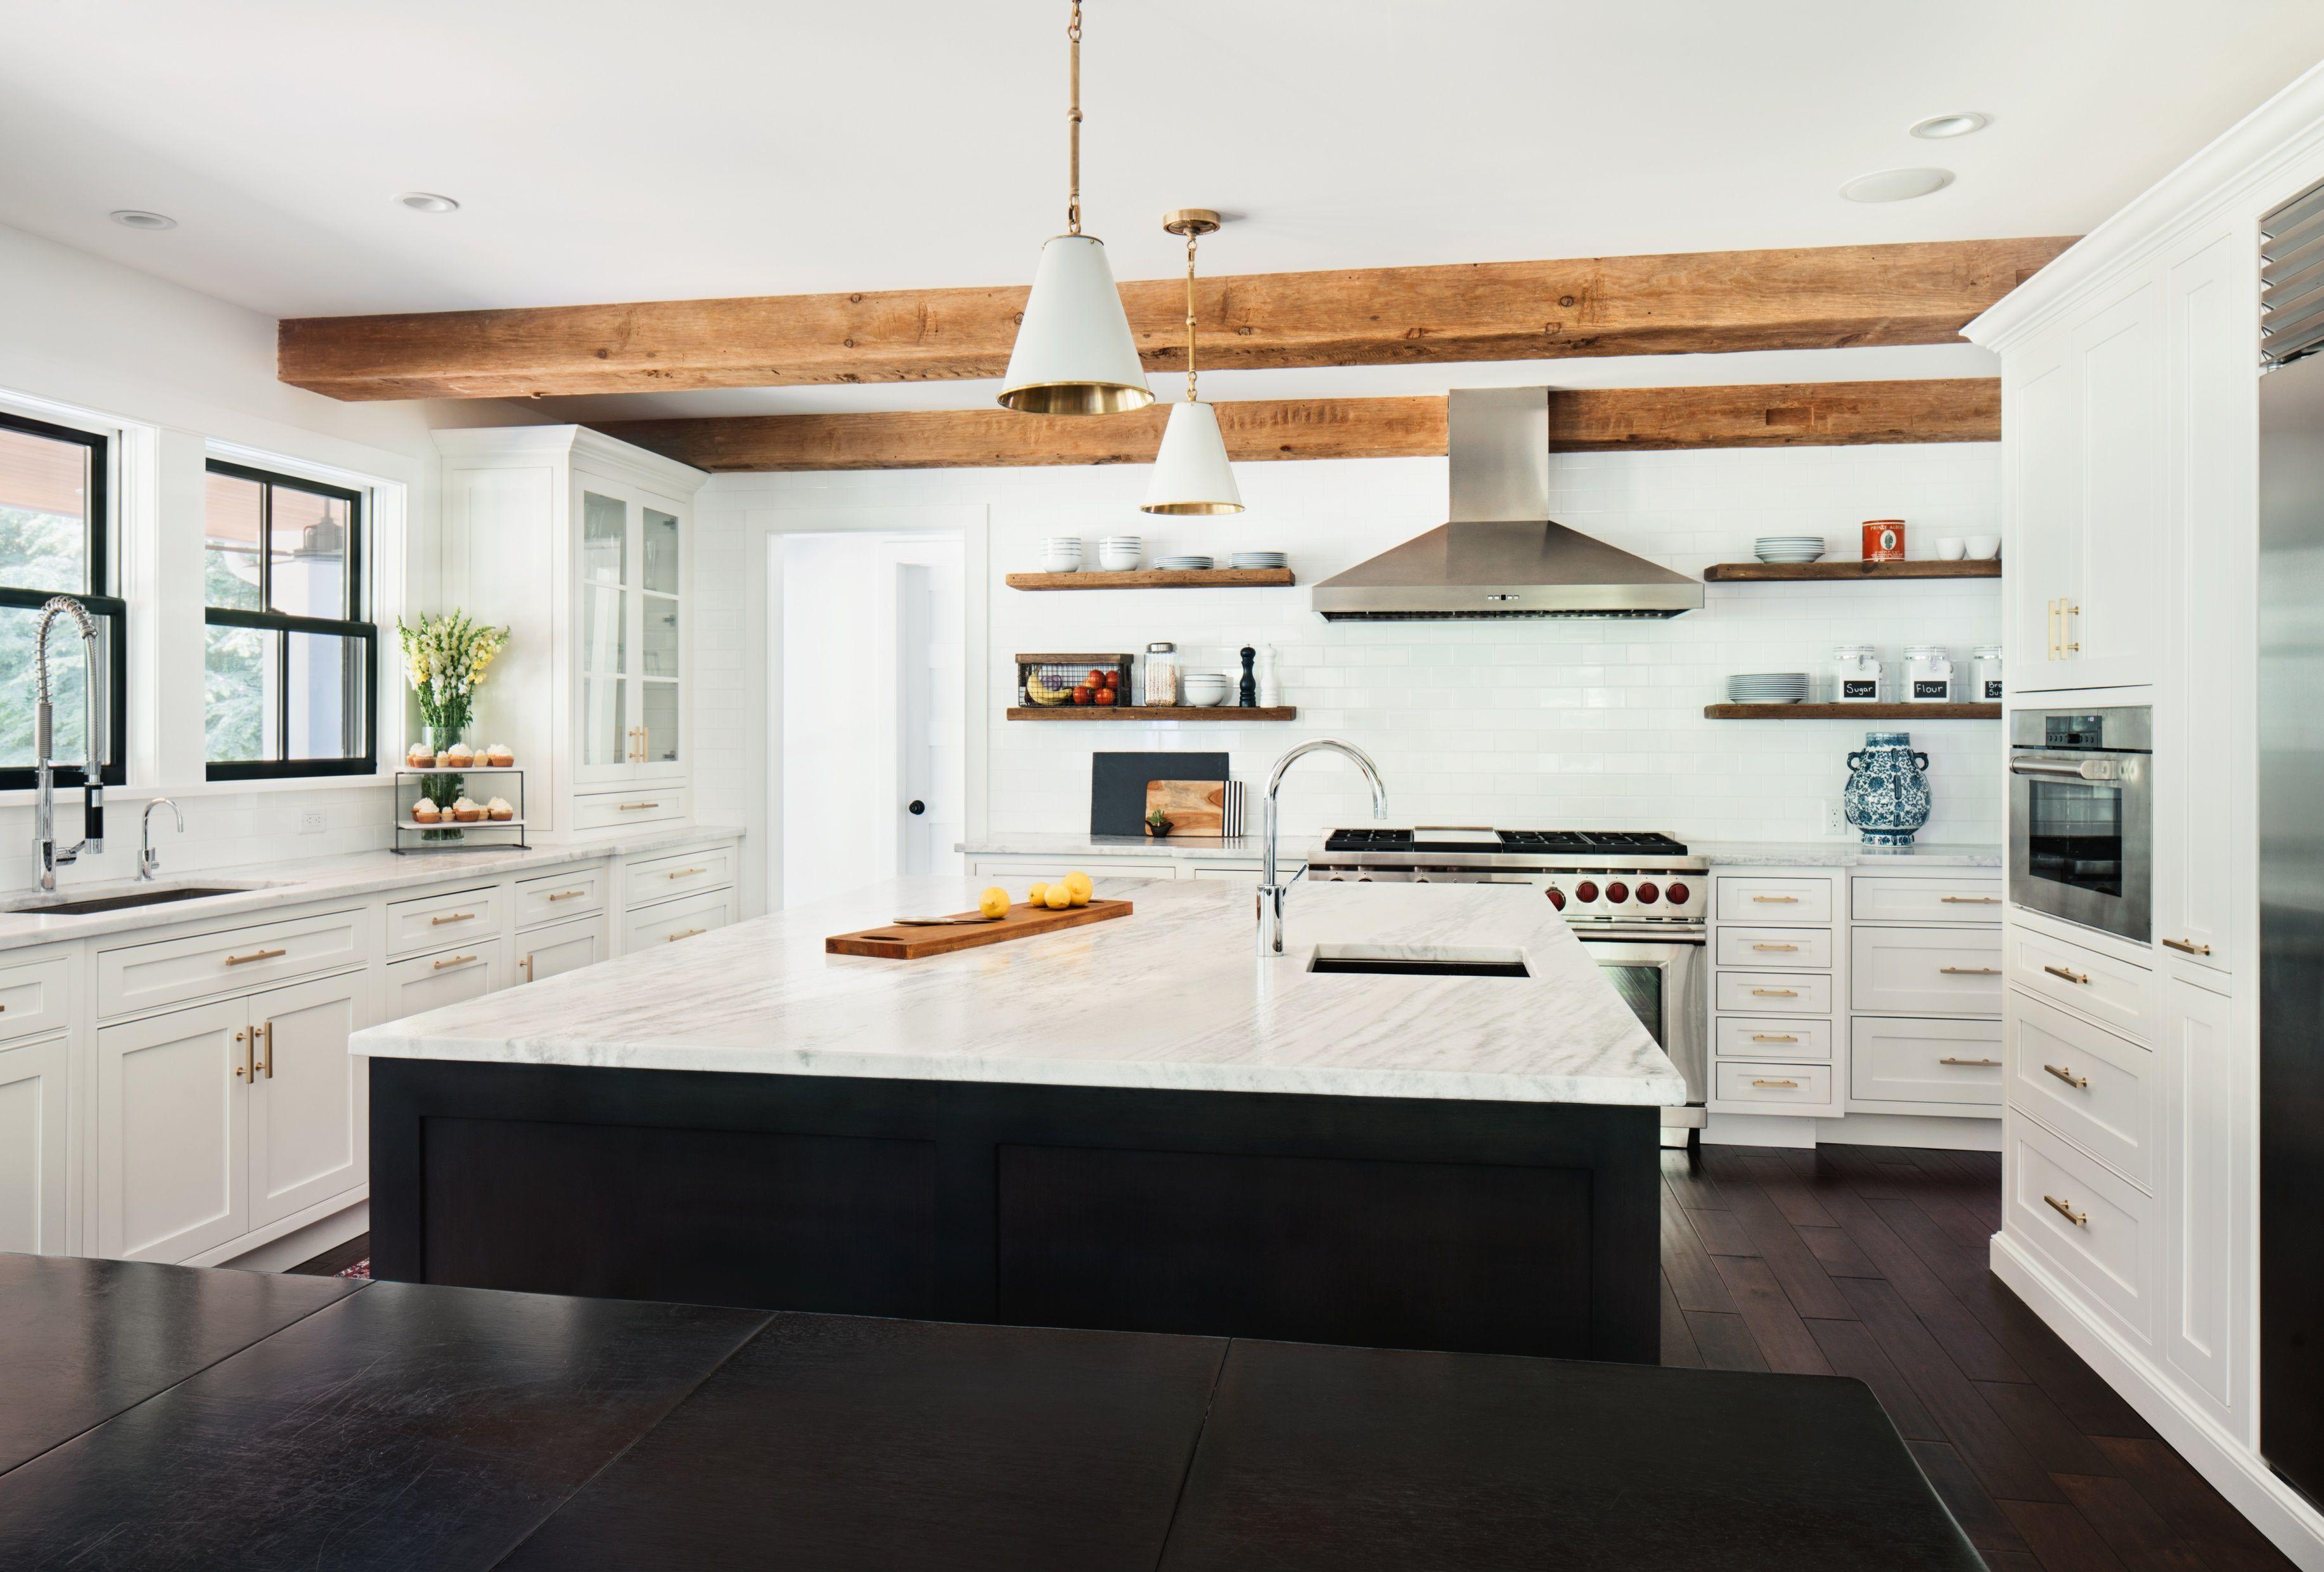 Oakwood Residence Modern Farmhouse Kitchen Z Interiors Home Kitchens Kitchen Inspirations Modern Farmhouse Kitchens